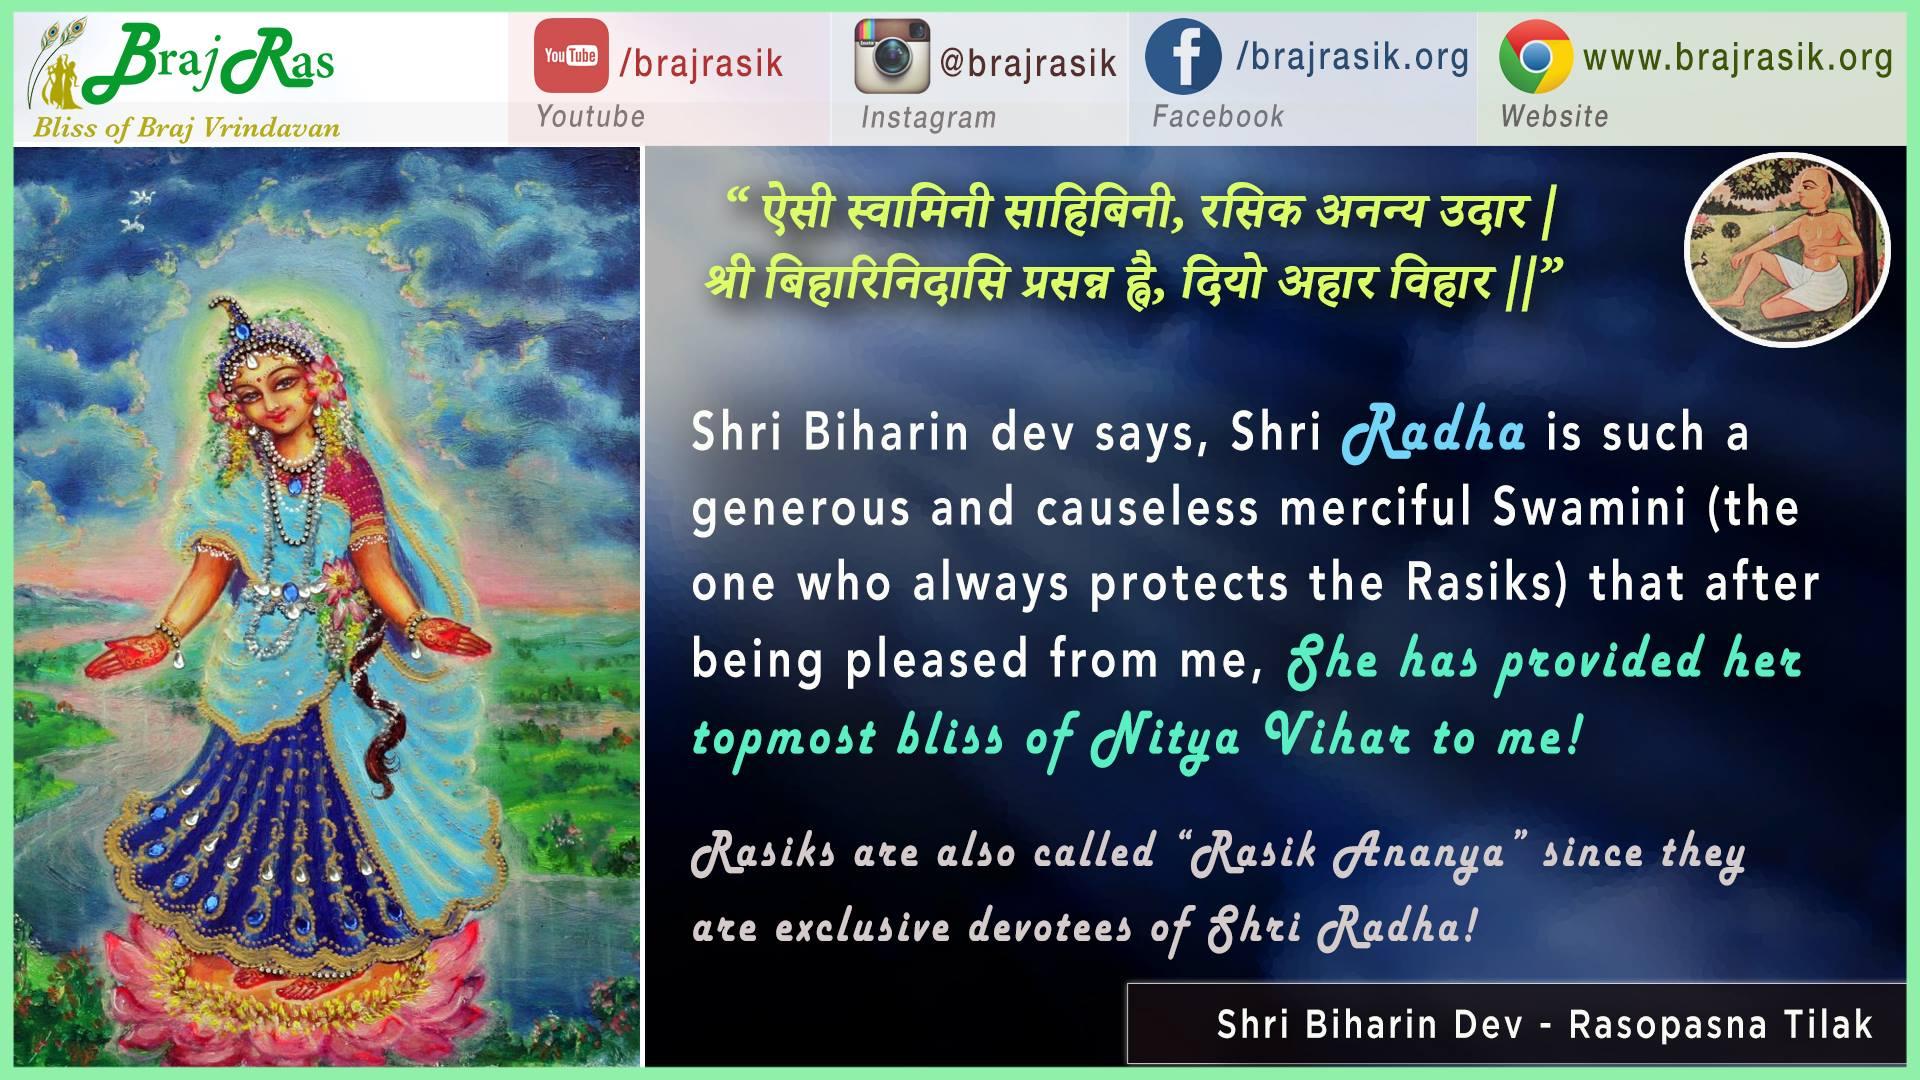 Aisi Swamini Sahibini - Shri Biharin Dev - Rasopasna Tilak